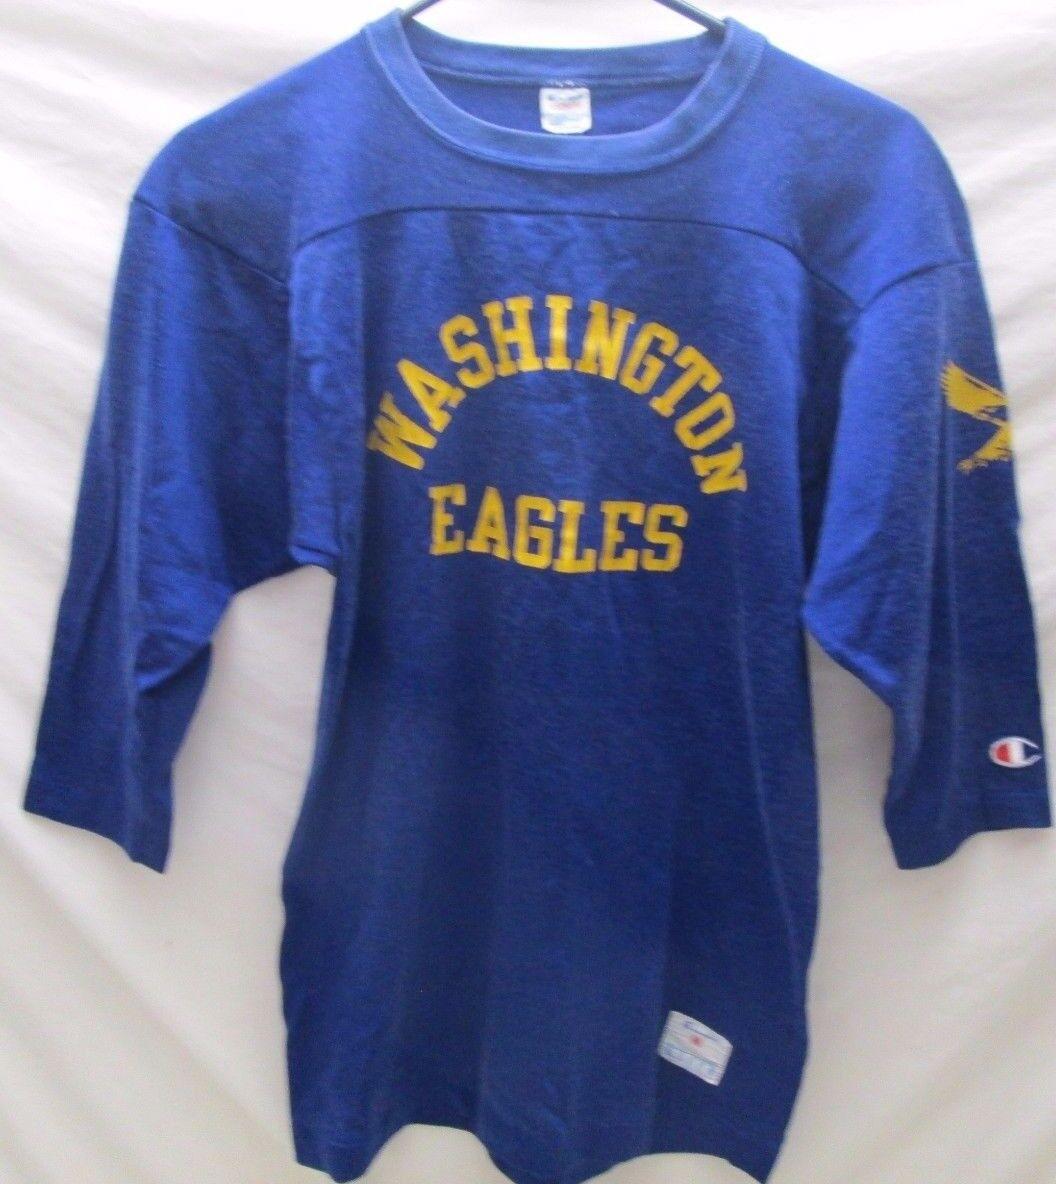 739a70fda Vintage Washington Eagles Jersey Size M Champion bluee gold Eagle Shirt Mens